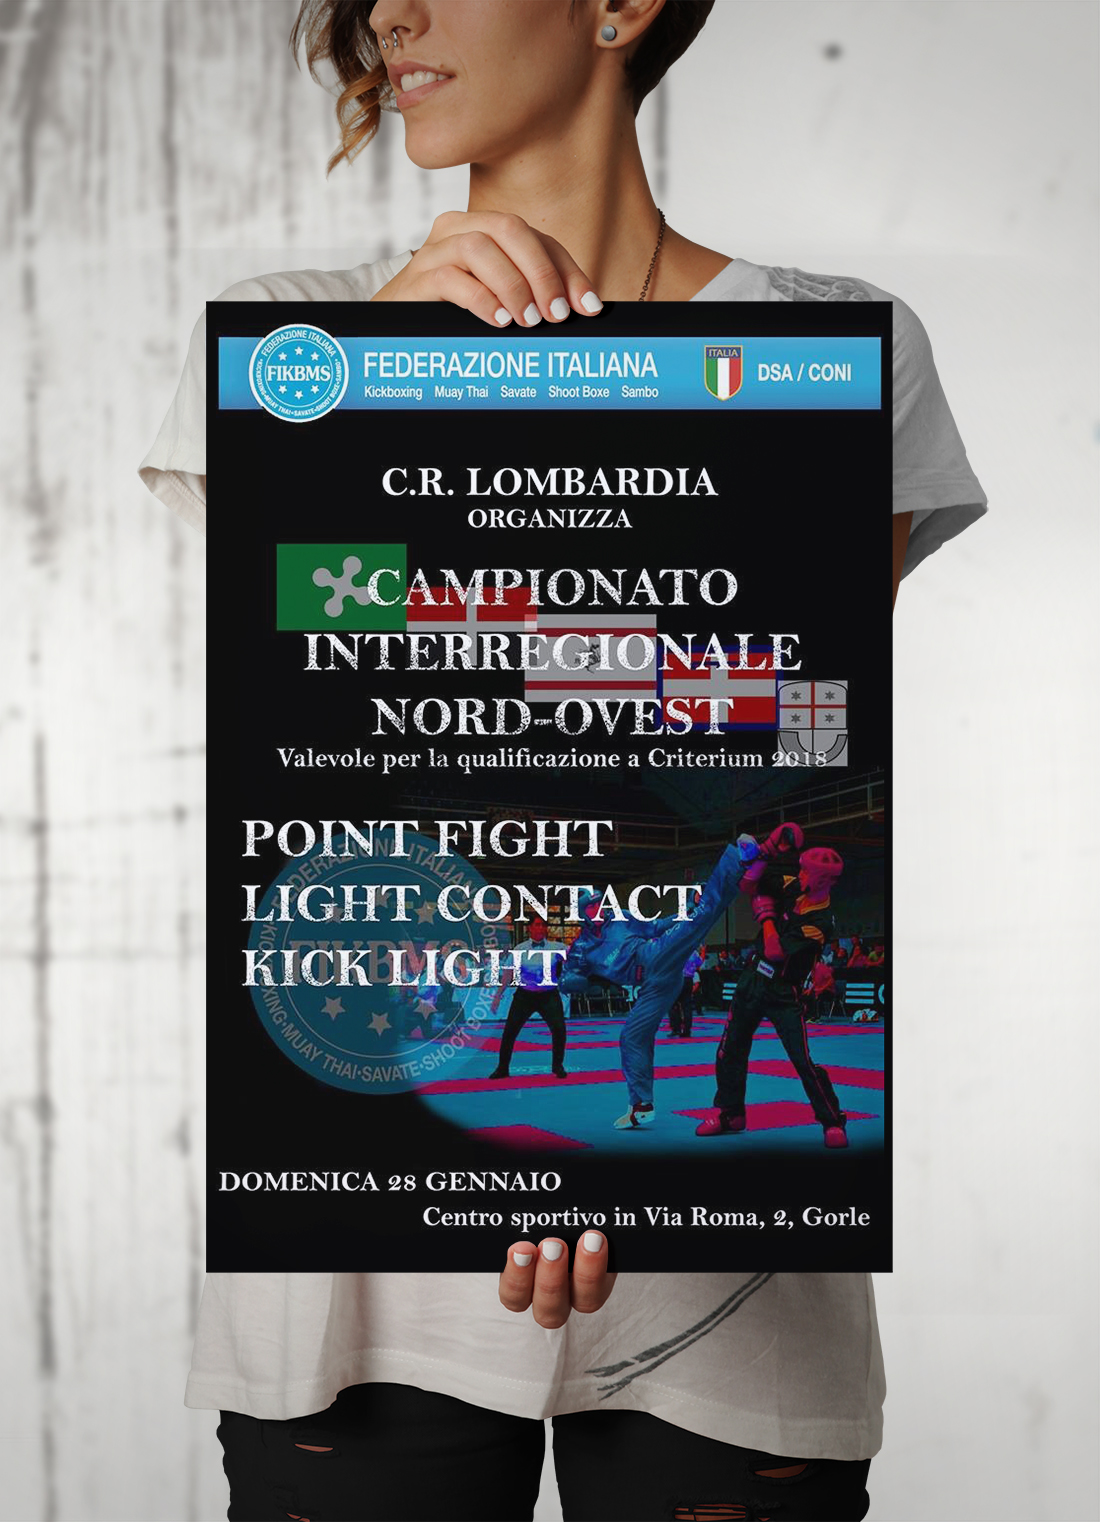 Campionato interregionale nord-ovet, ASD La Dama Kombat, palestra savate, kick boxing, k1, Genova